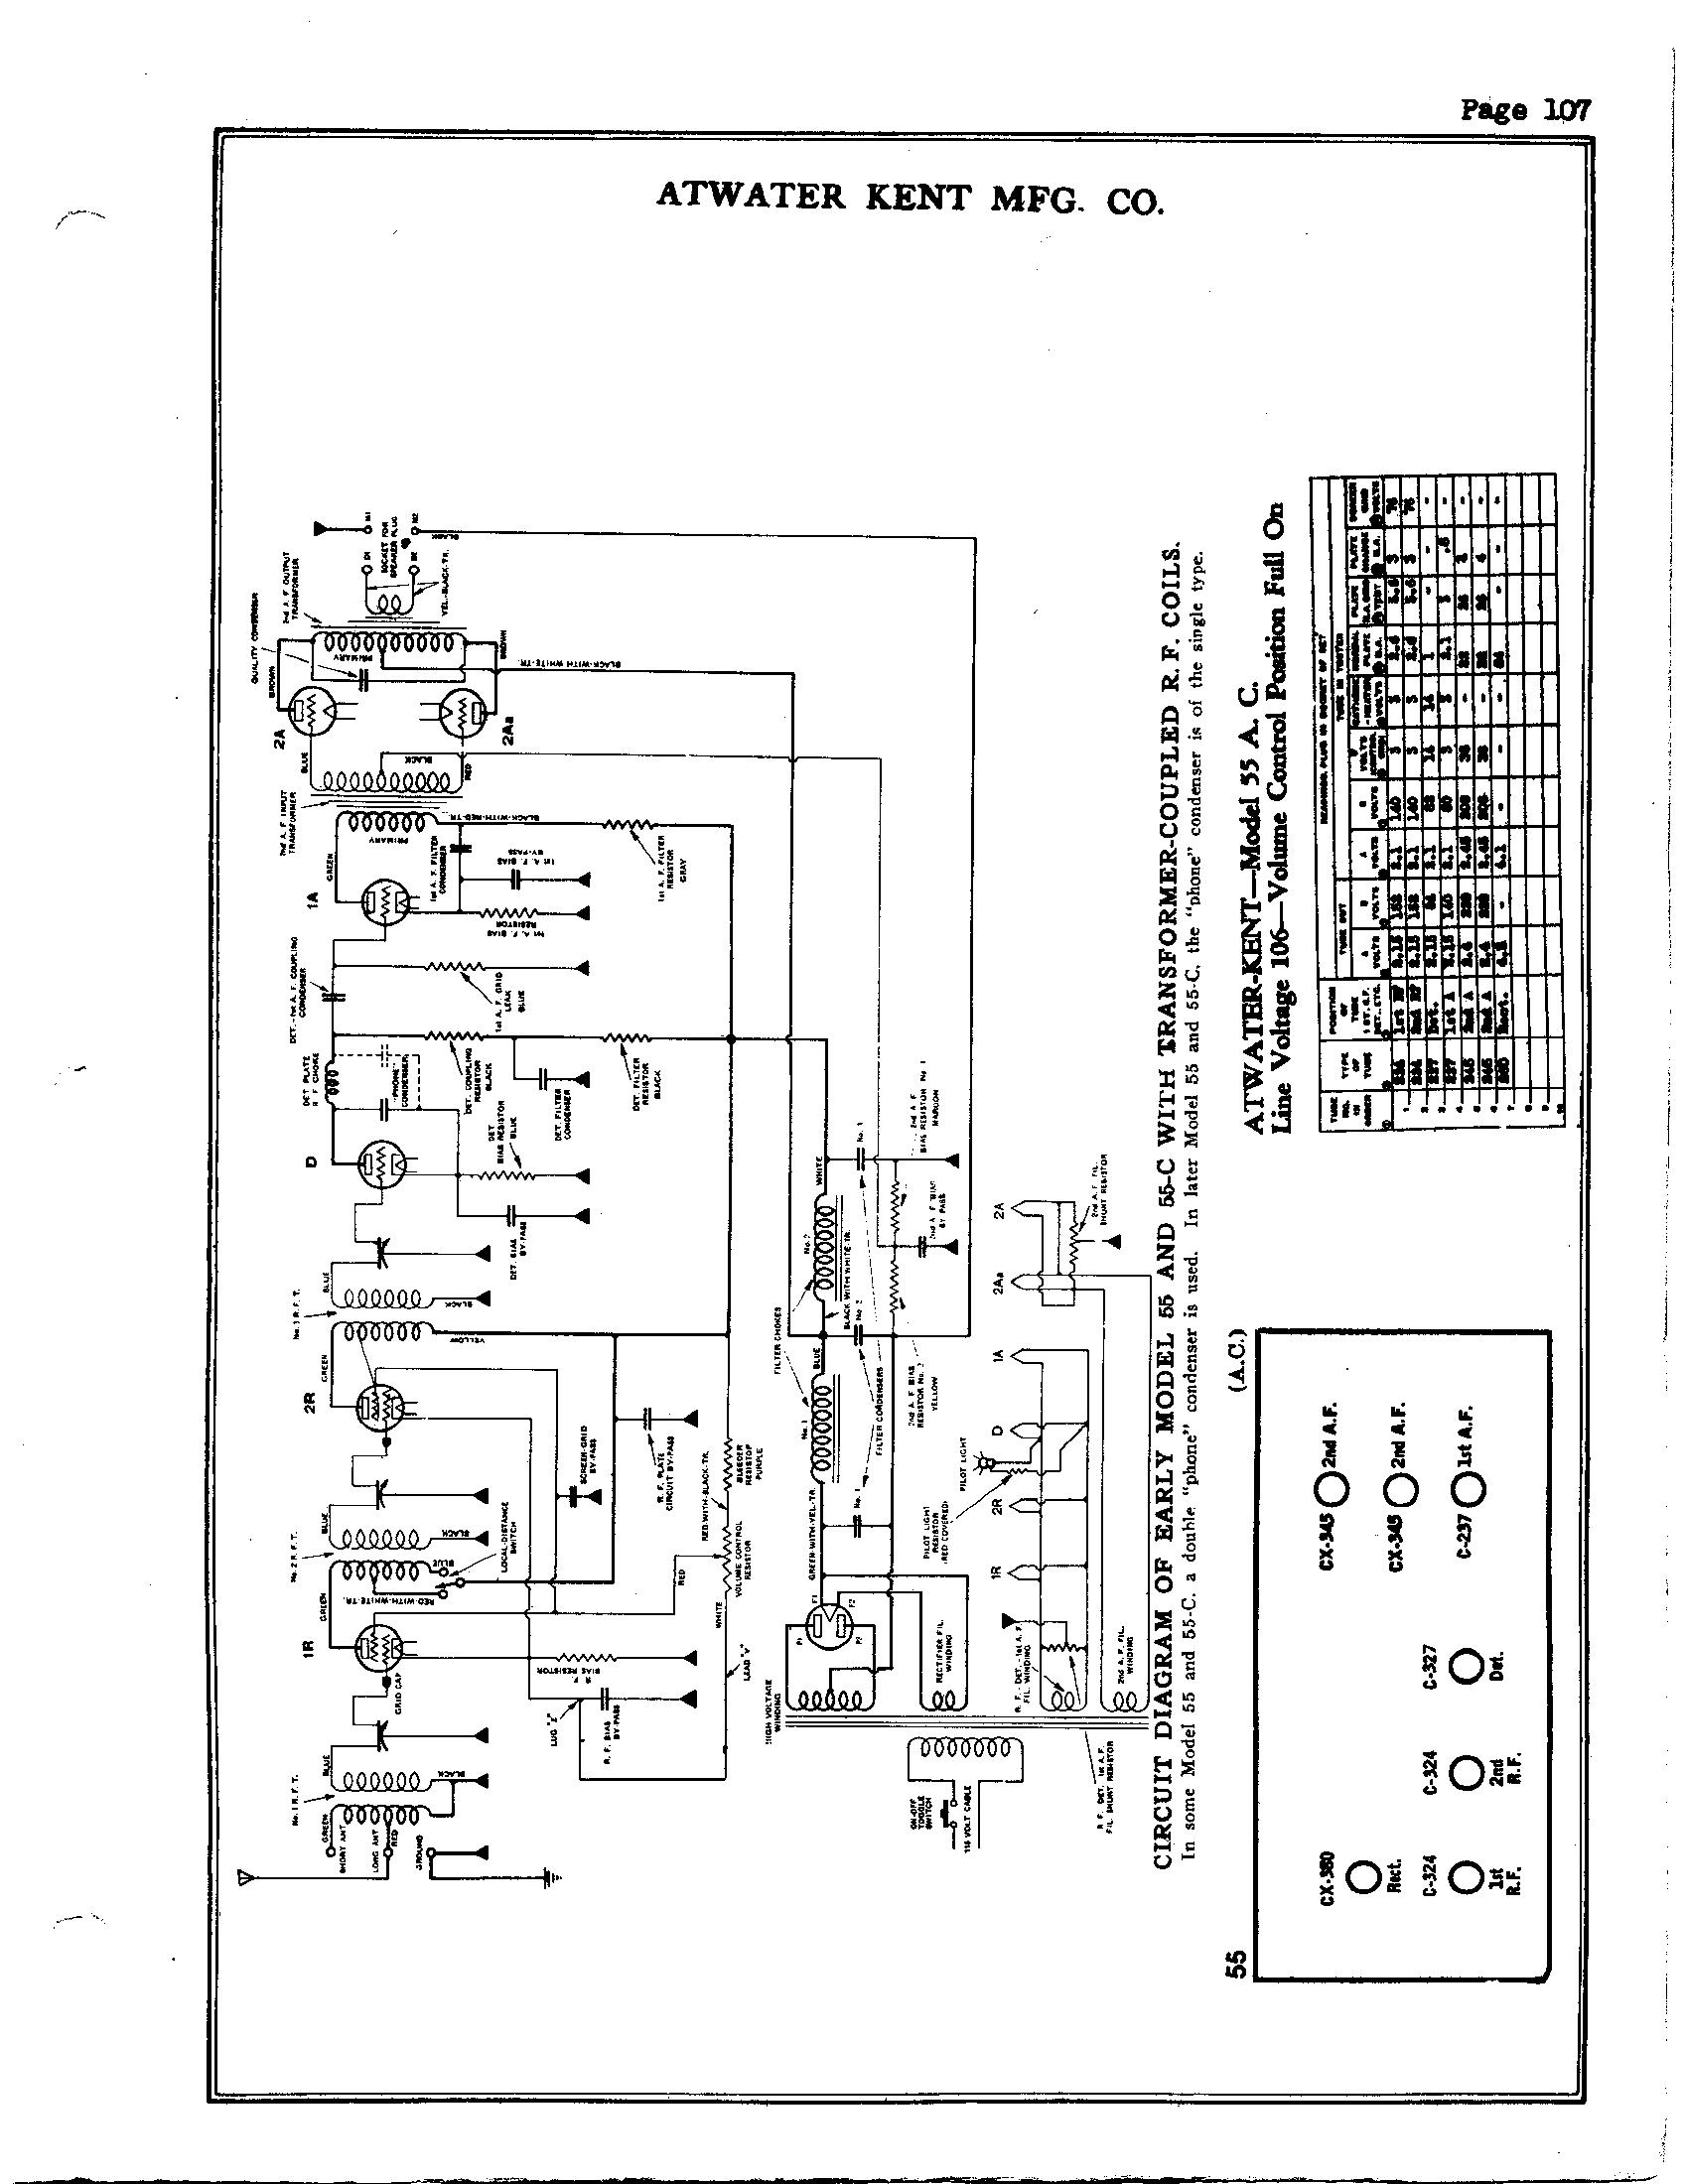 bobcat 753 hydraulic schematics